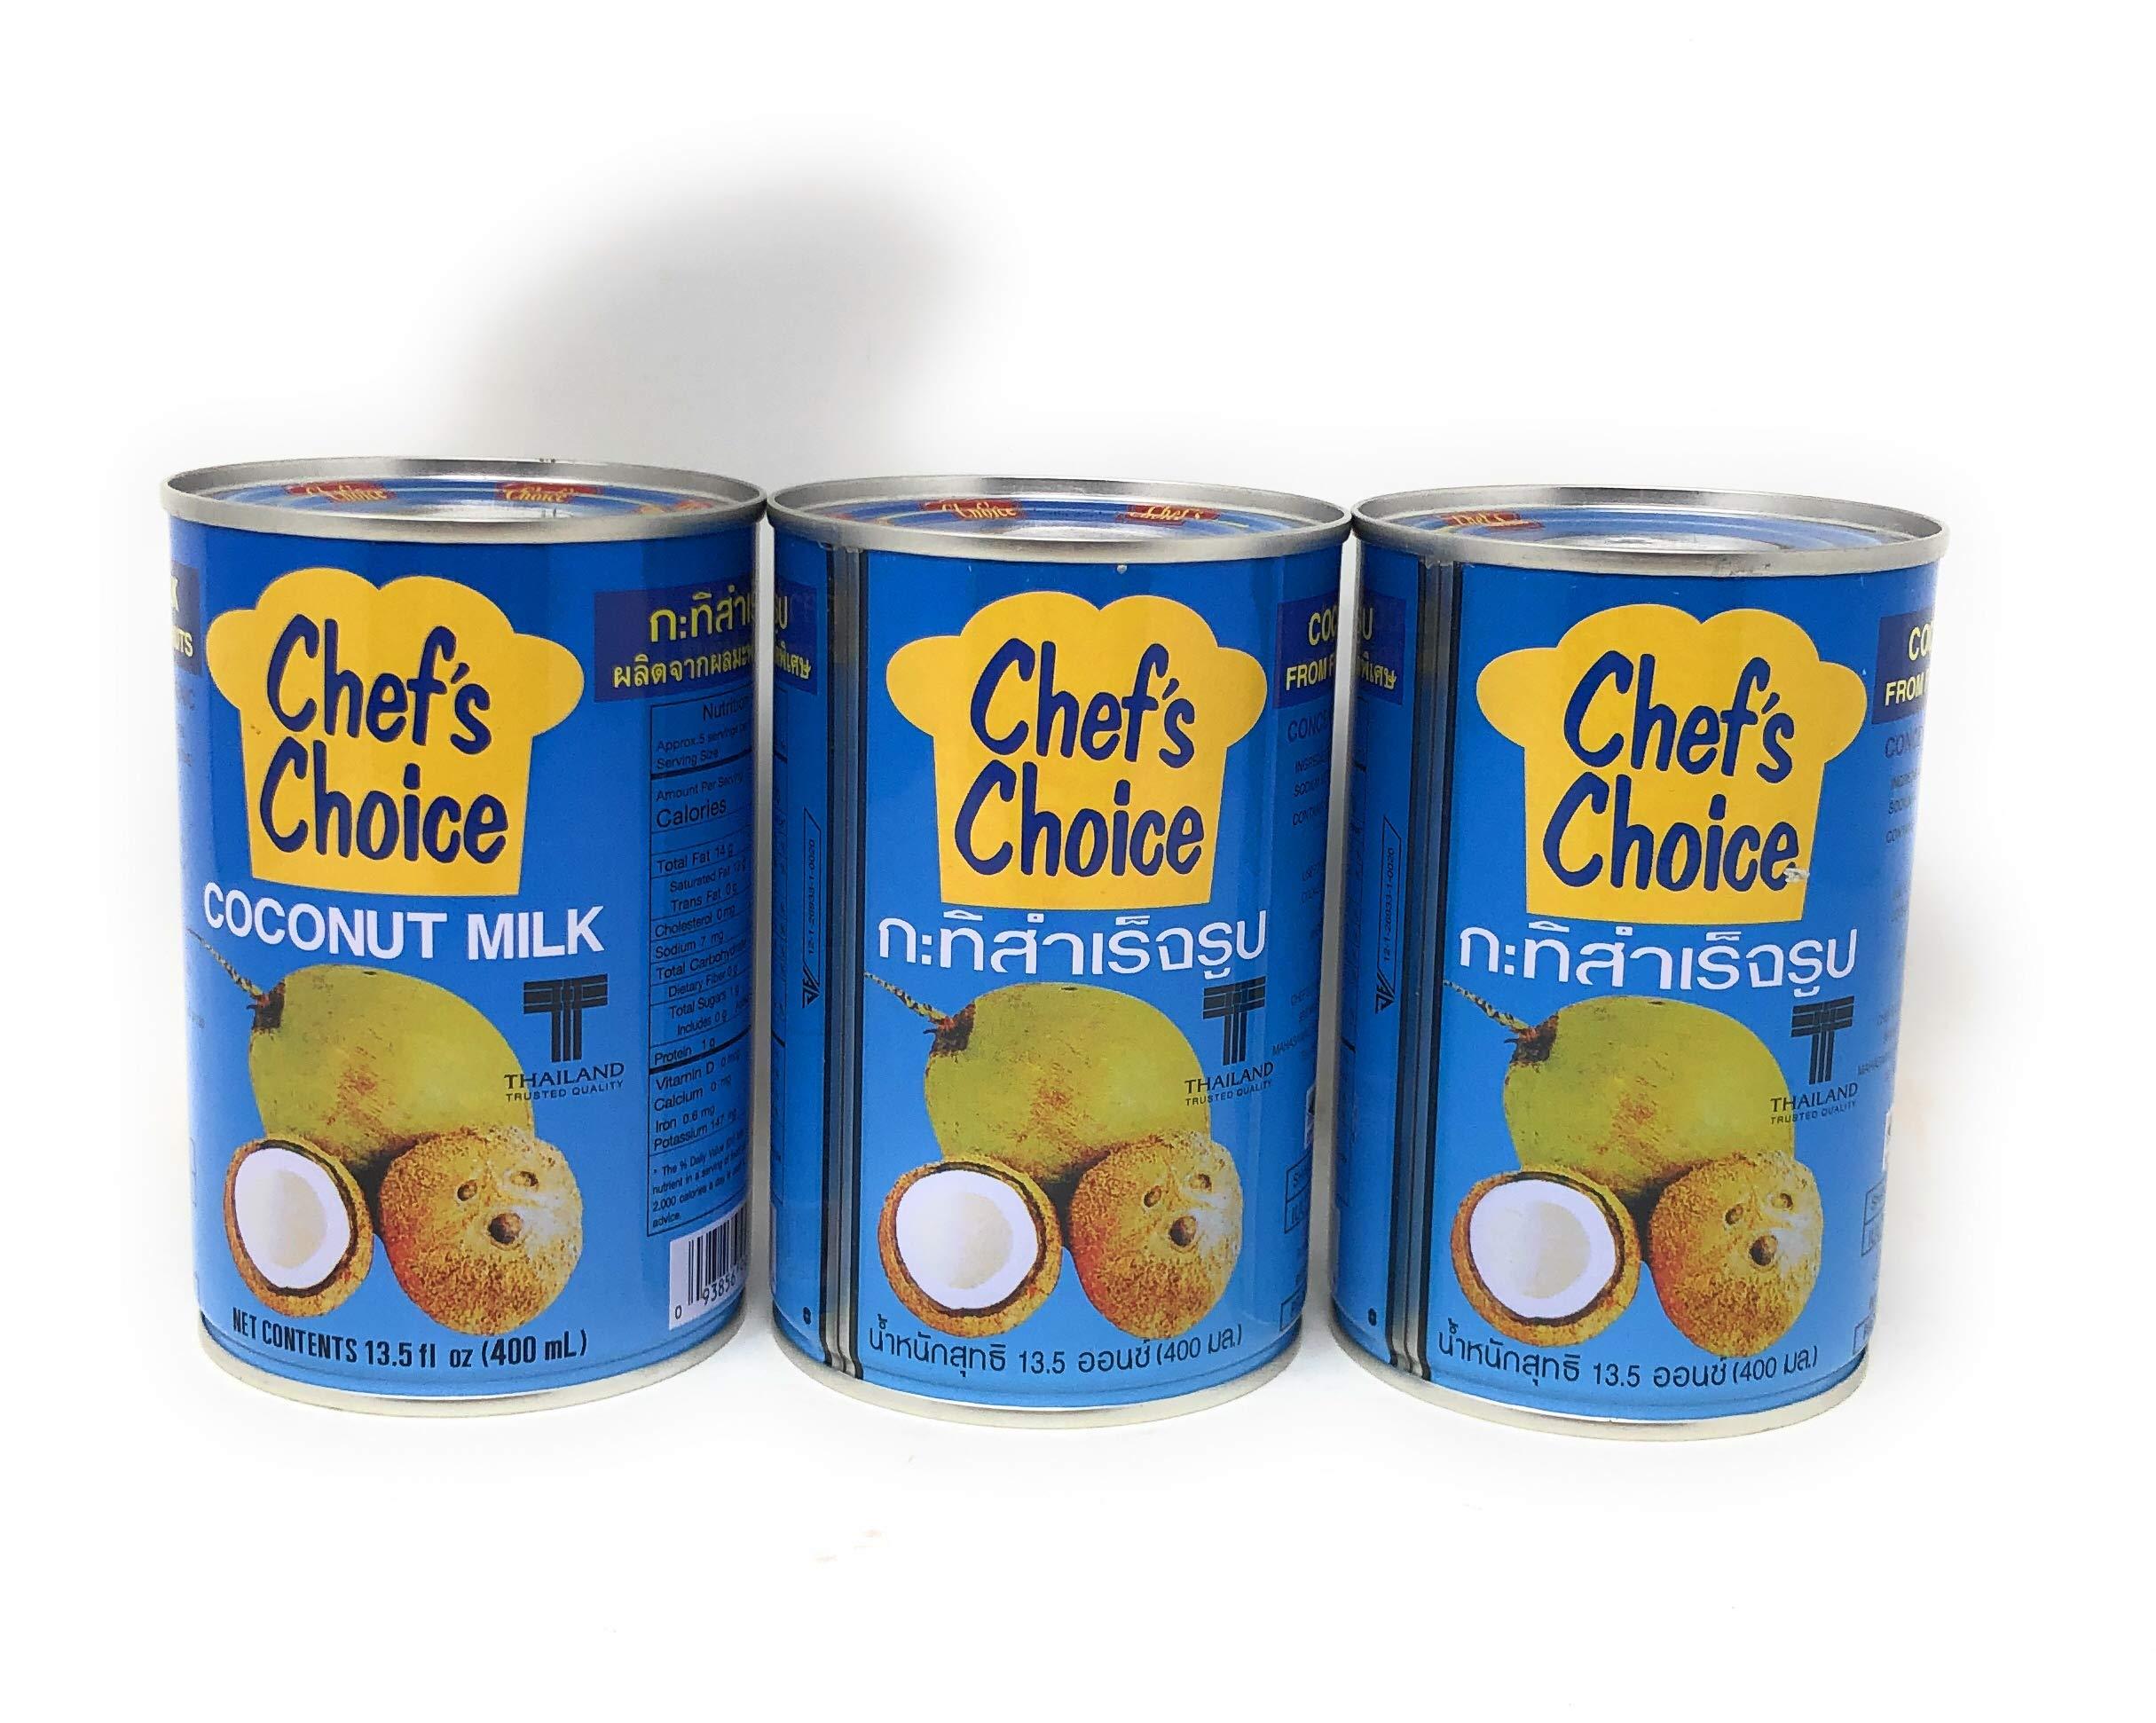 Chefs Choice Coconut Milk 13.5 oz (400ml) 3 pack